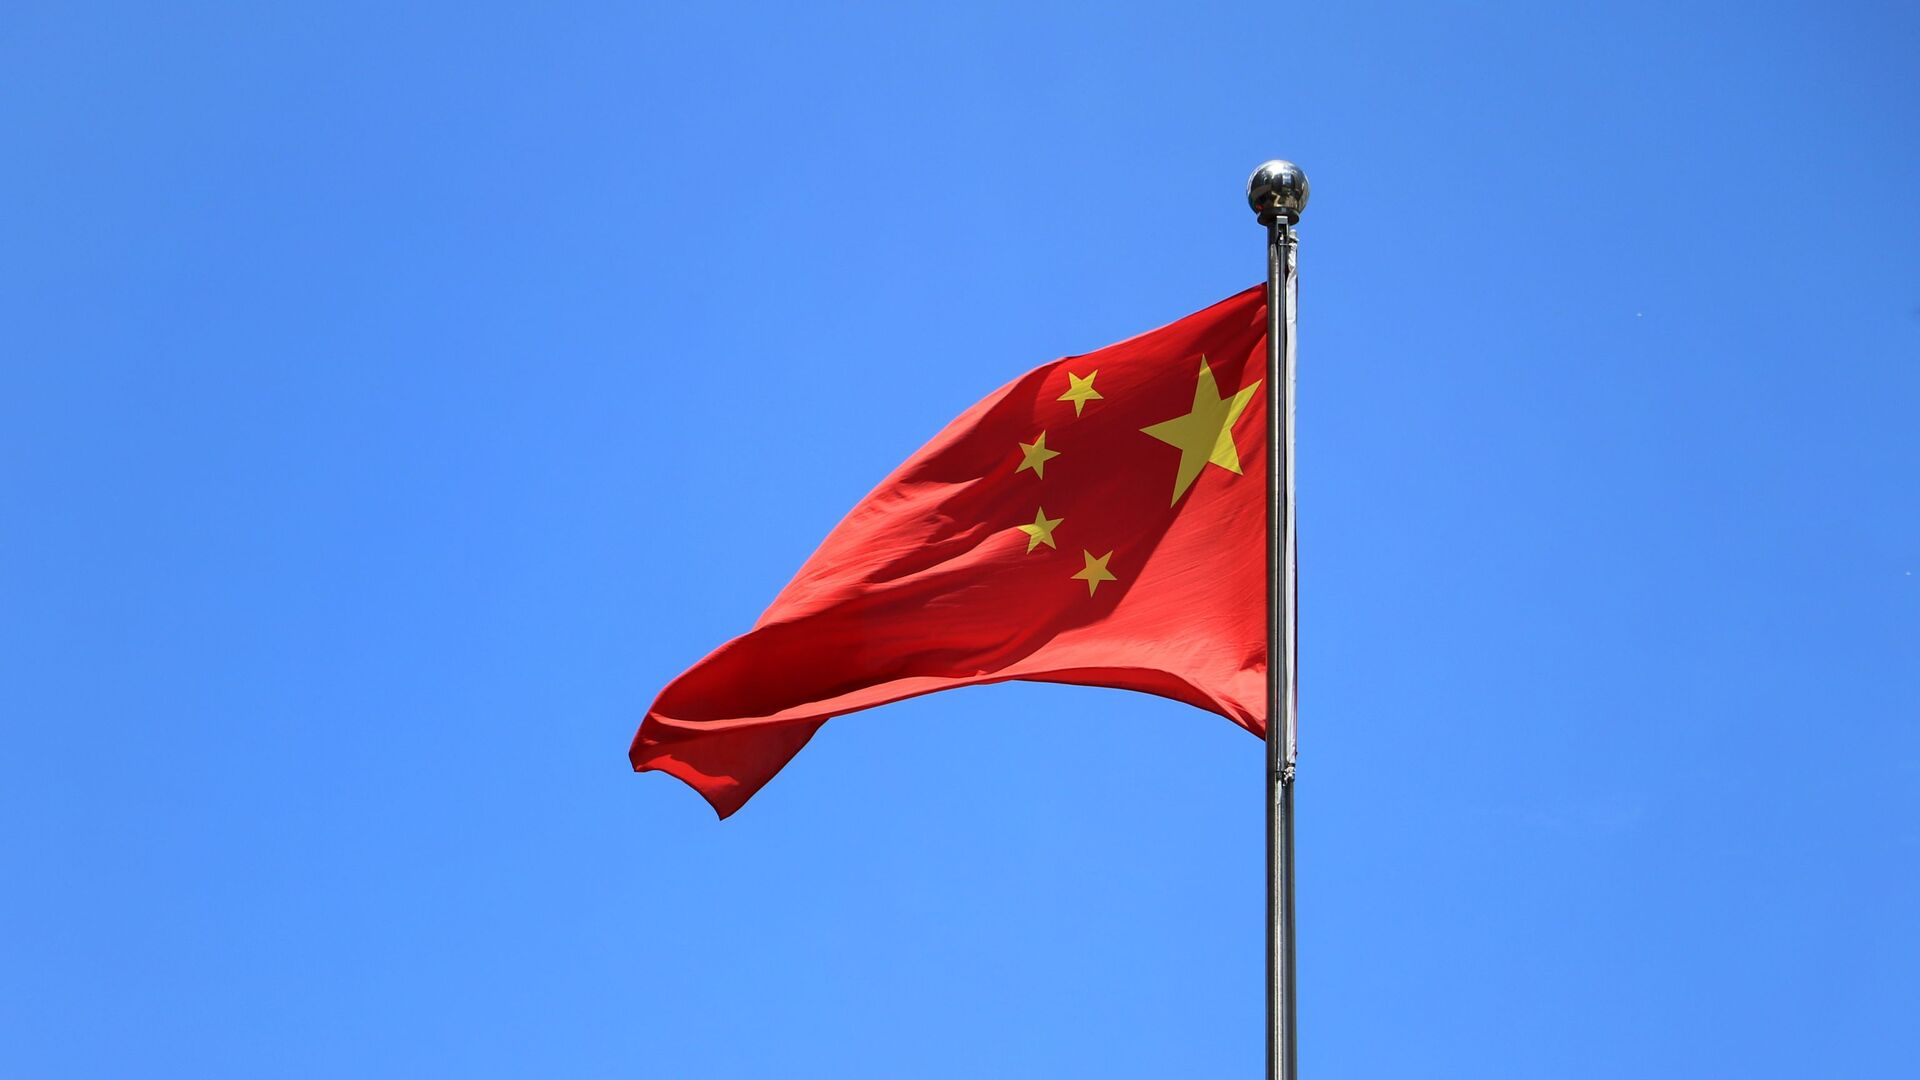 La bandera de China - Sputnik Mundo, 1920, 30.09.2021